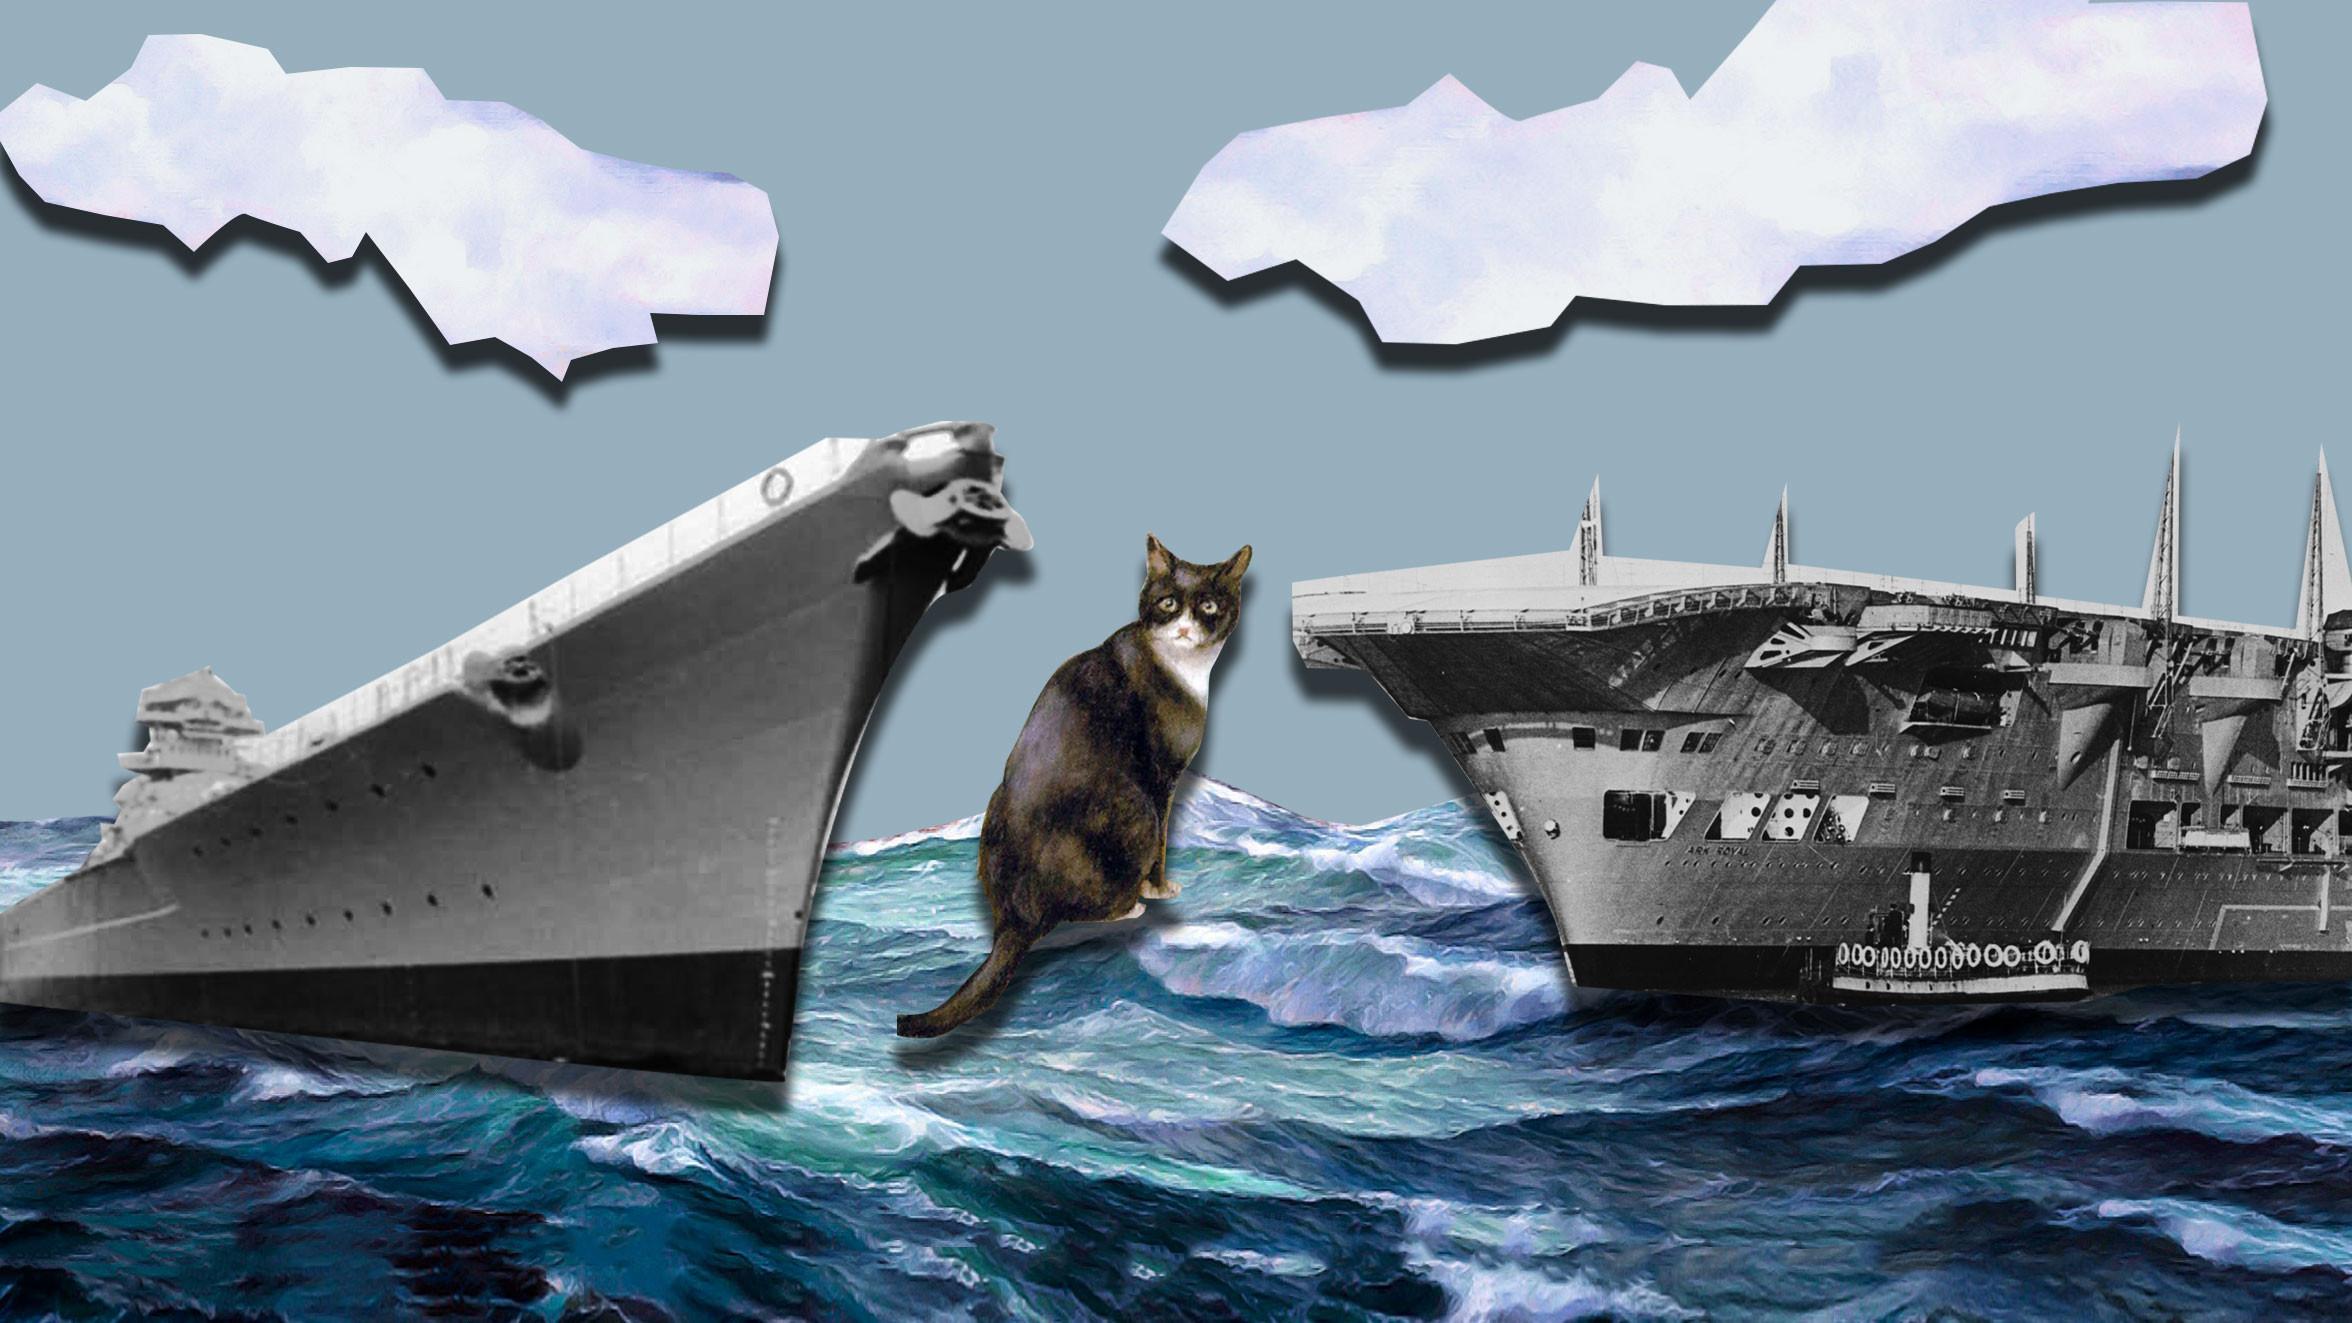 "<p>Коллаж &copy; L!FE Фото: &copy;&nbsp;<span>wikipedia.org &copy;&nbsp;<a href=""https://en.wikipedia.org/wiki/German_battleship_Bismarck#/media/File:Bundesarchiv_Bild_101II-MN-1361-16A,_Schlachtschiff_Bismarck,_Indienststellung.jpg"" target=""_blank"">wikipedia.org/Bundesarchiv, Bild</a></span></p>"